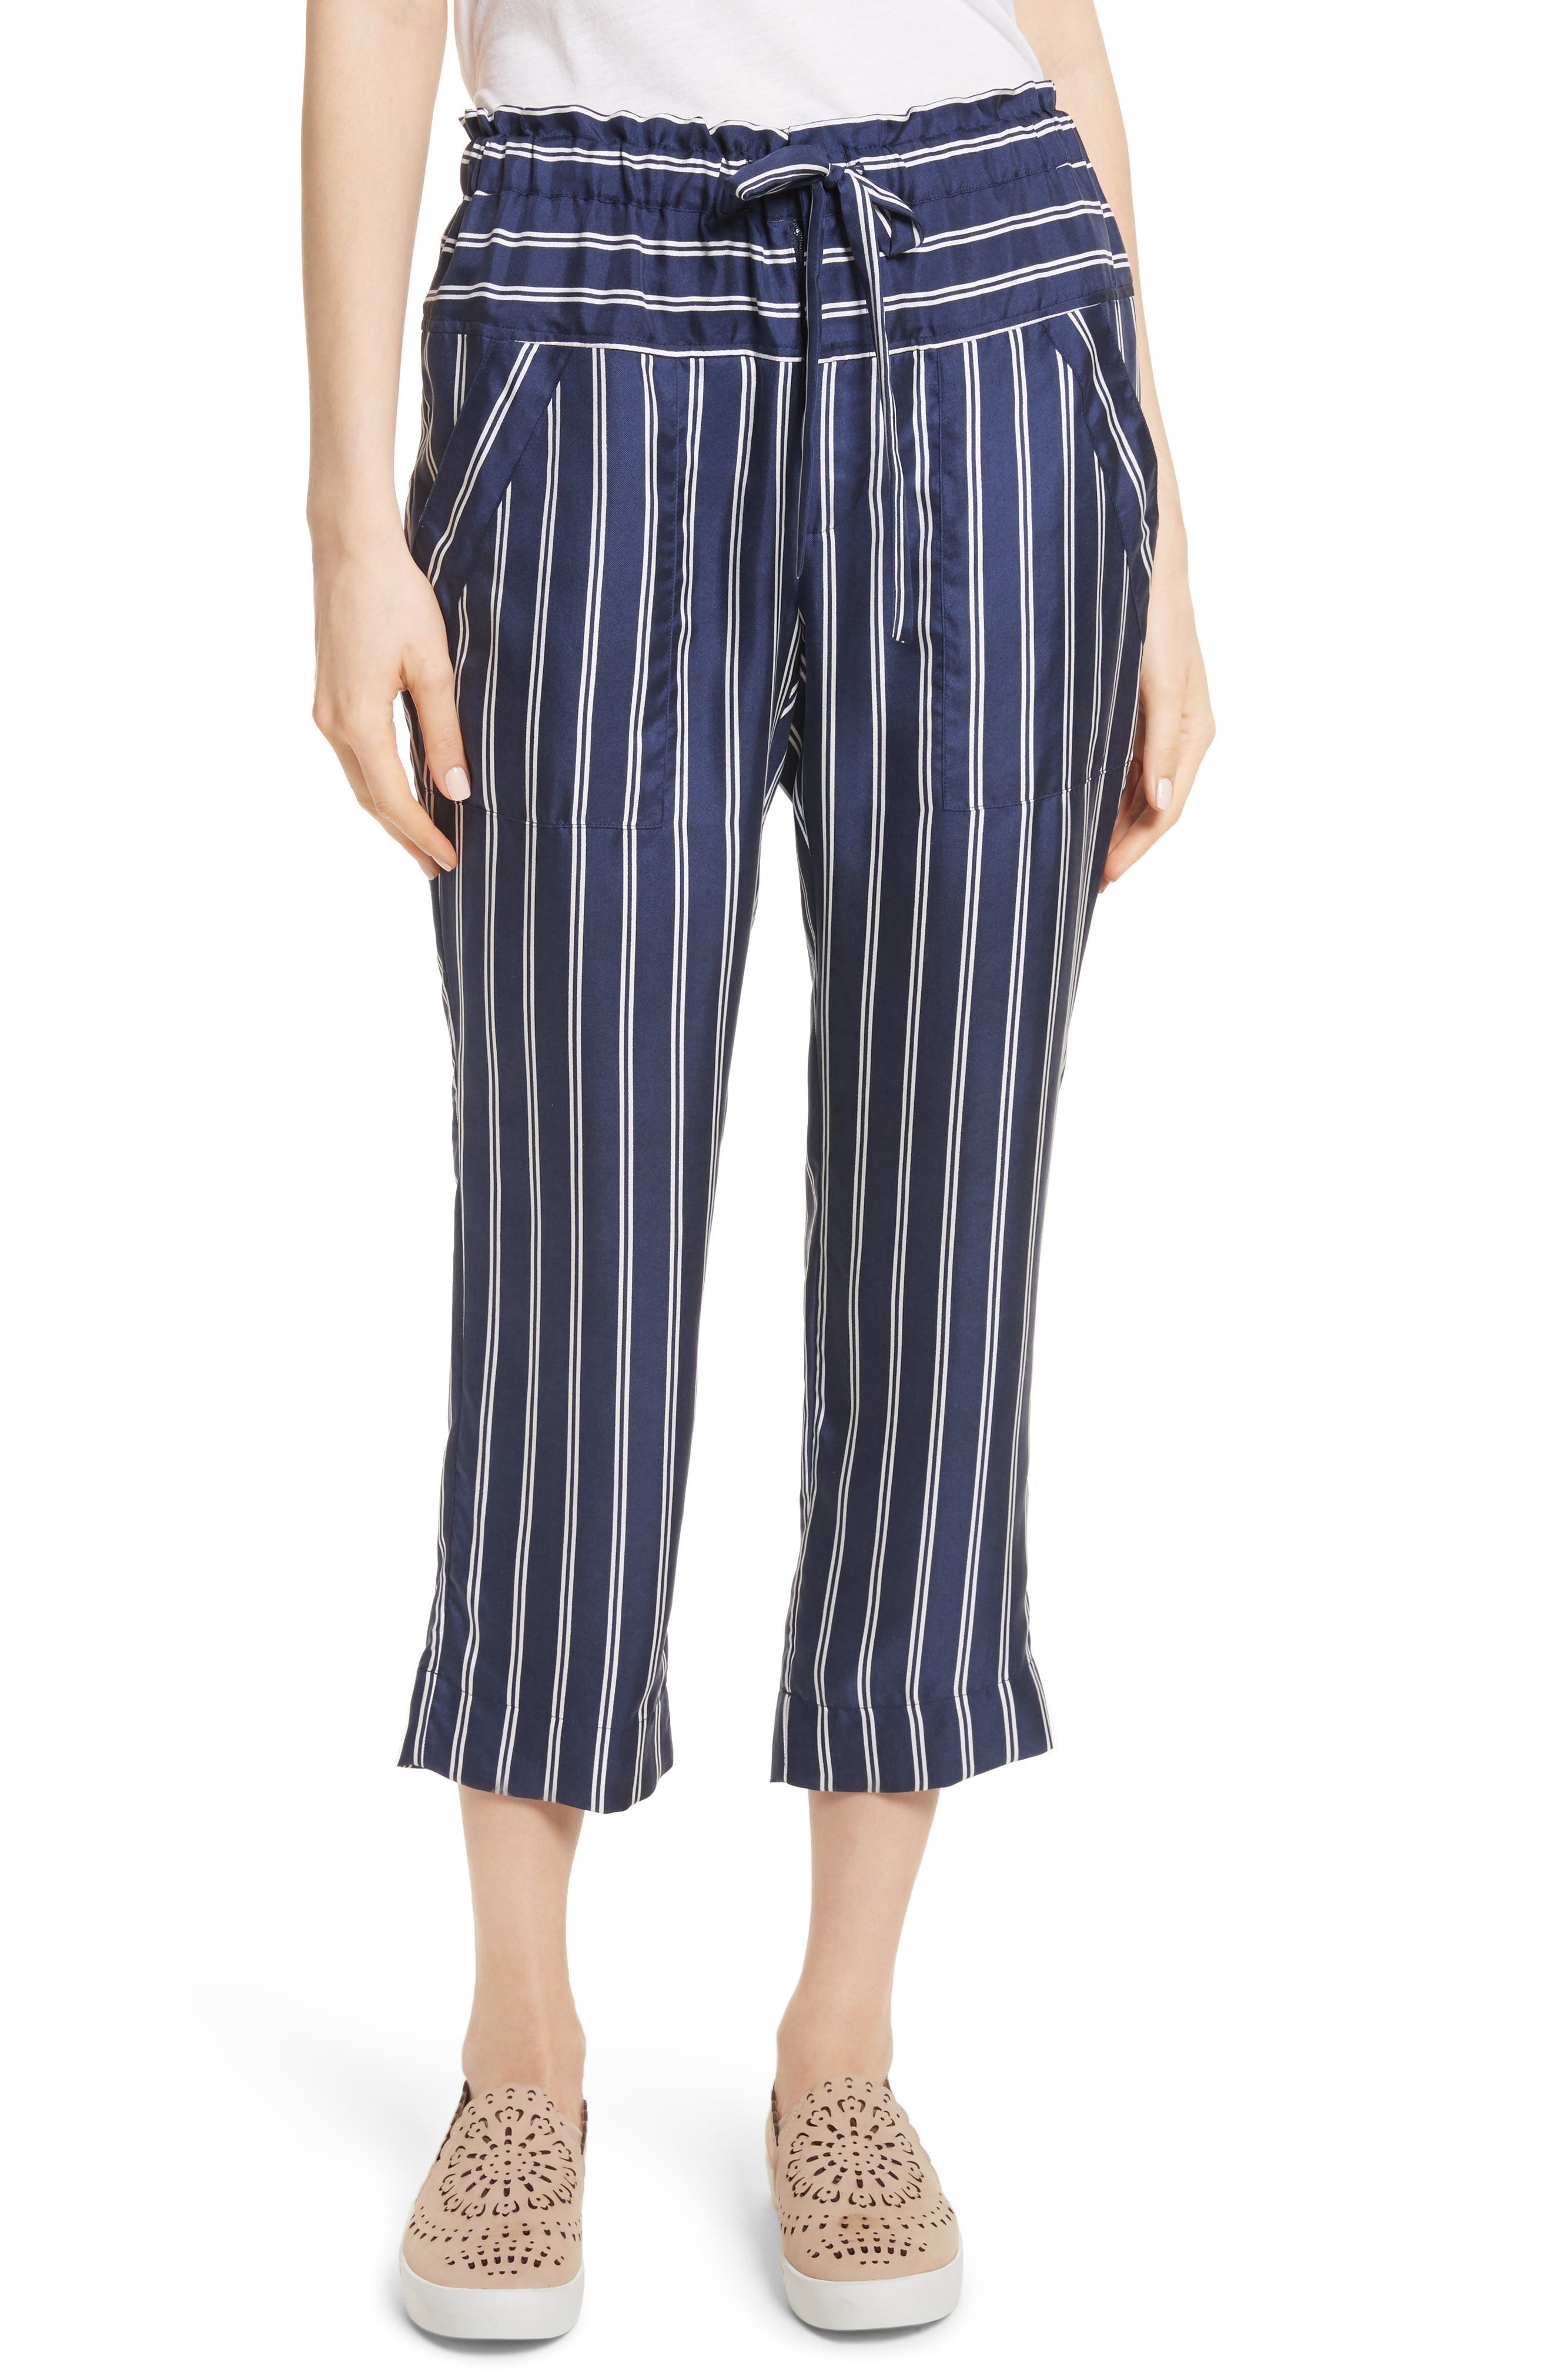 Addiena Stripe Silk Pants,                         Main,                         color, Dark Navy